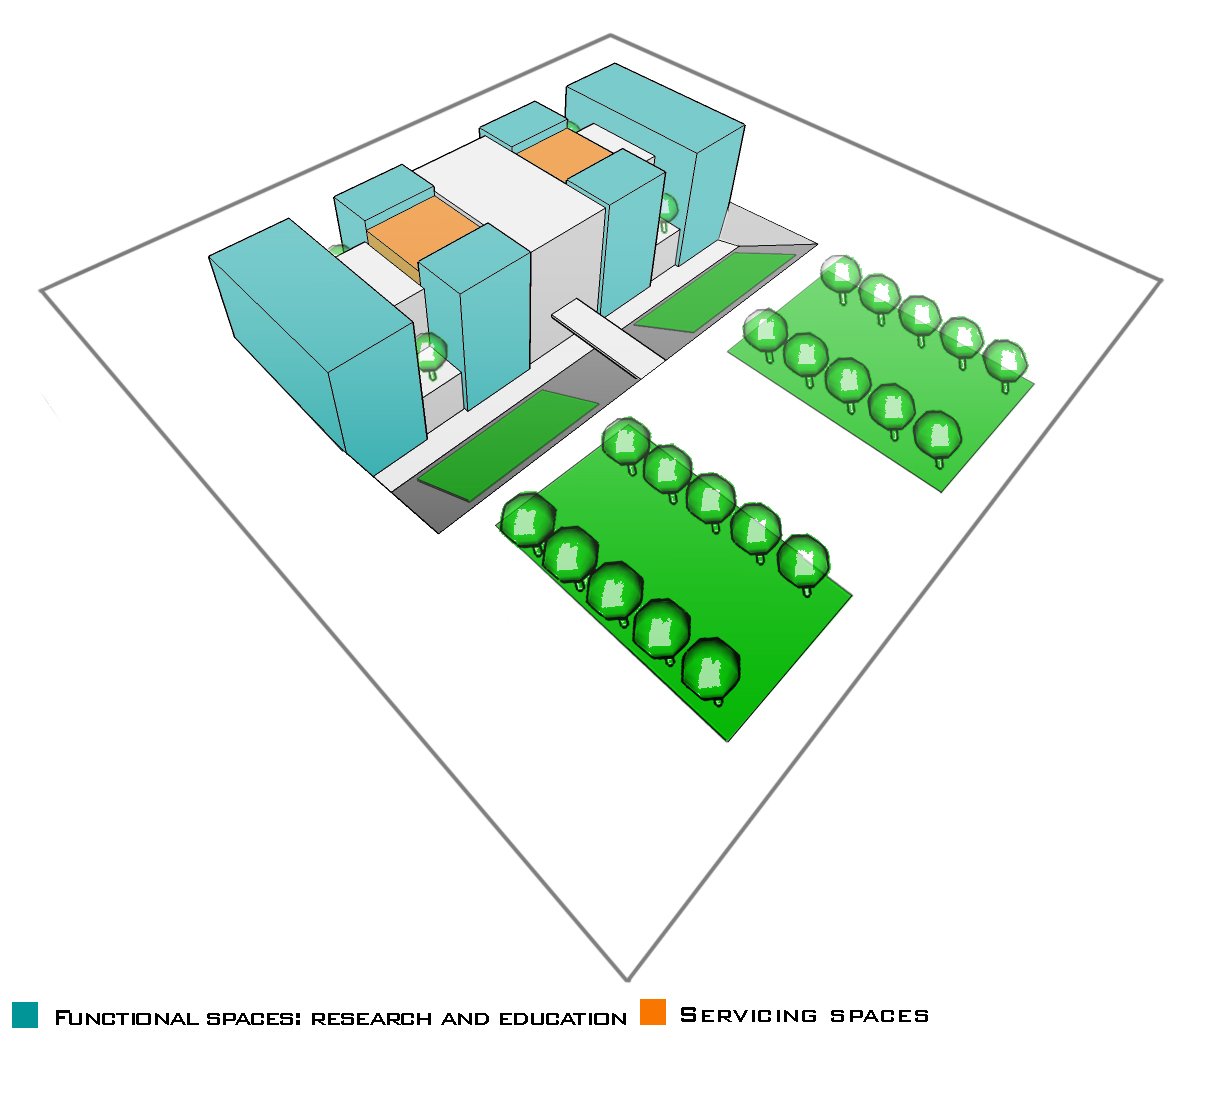 Royan reseach lab